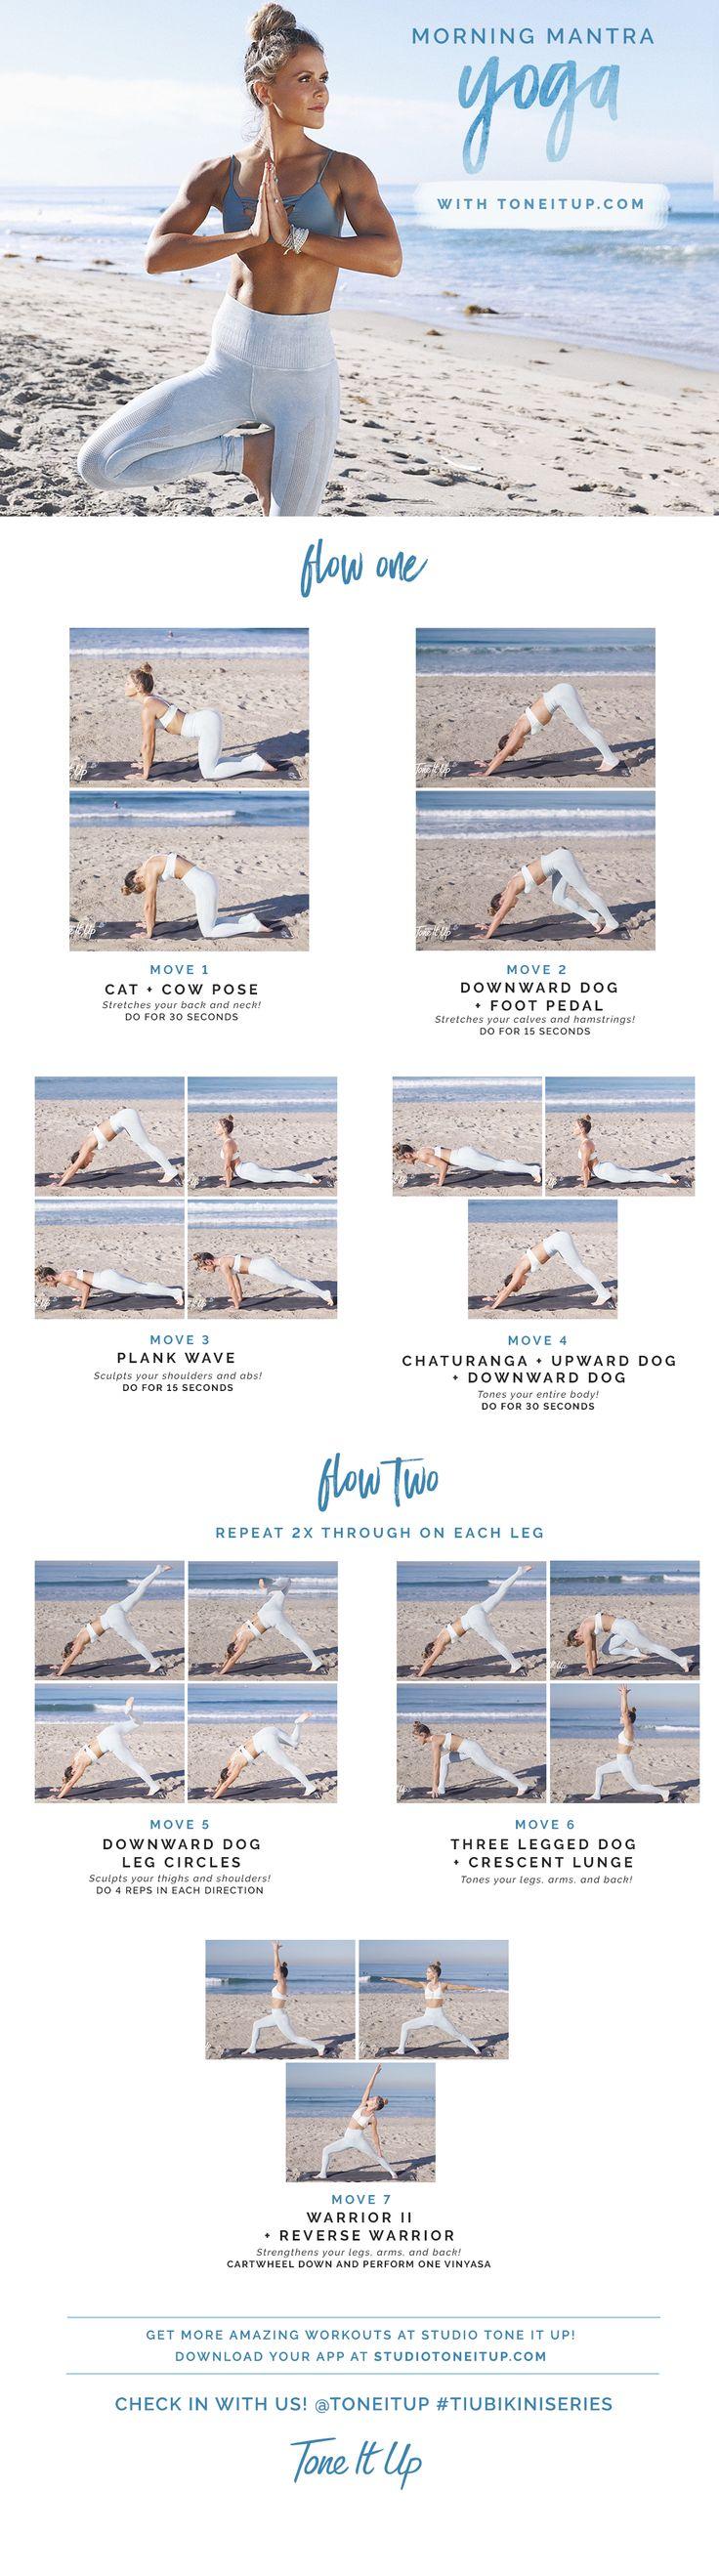 Morning Mantra Yoga — TIU Tuesday! – Robin Quintal